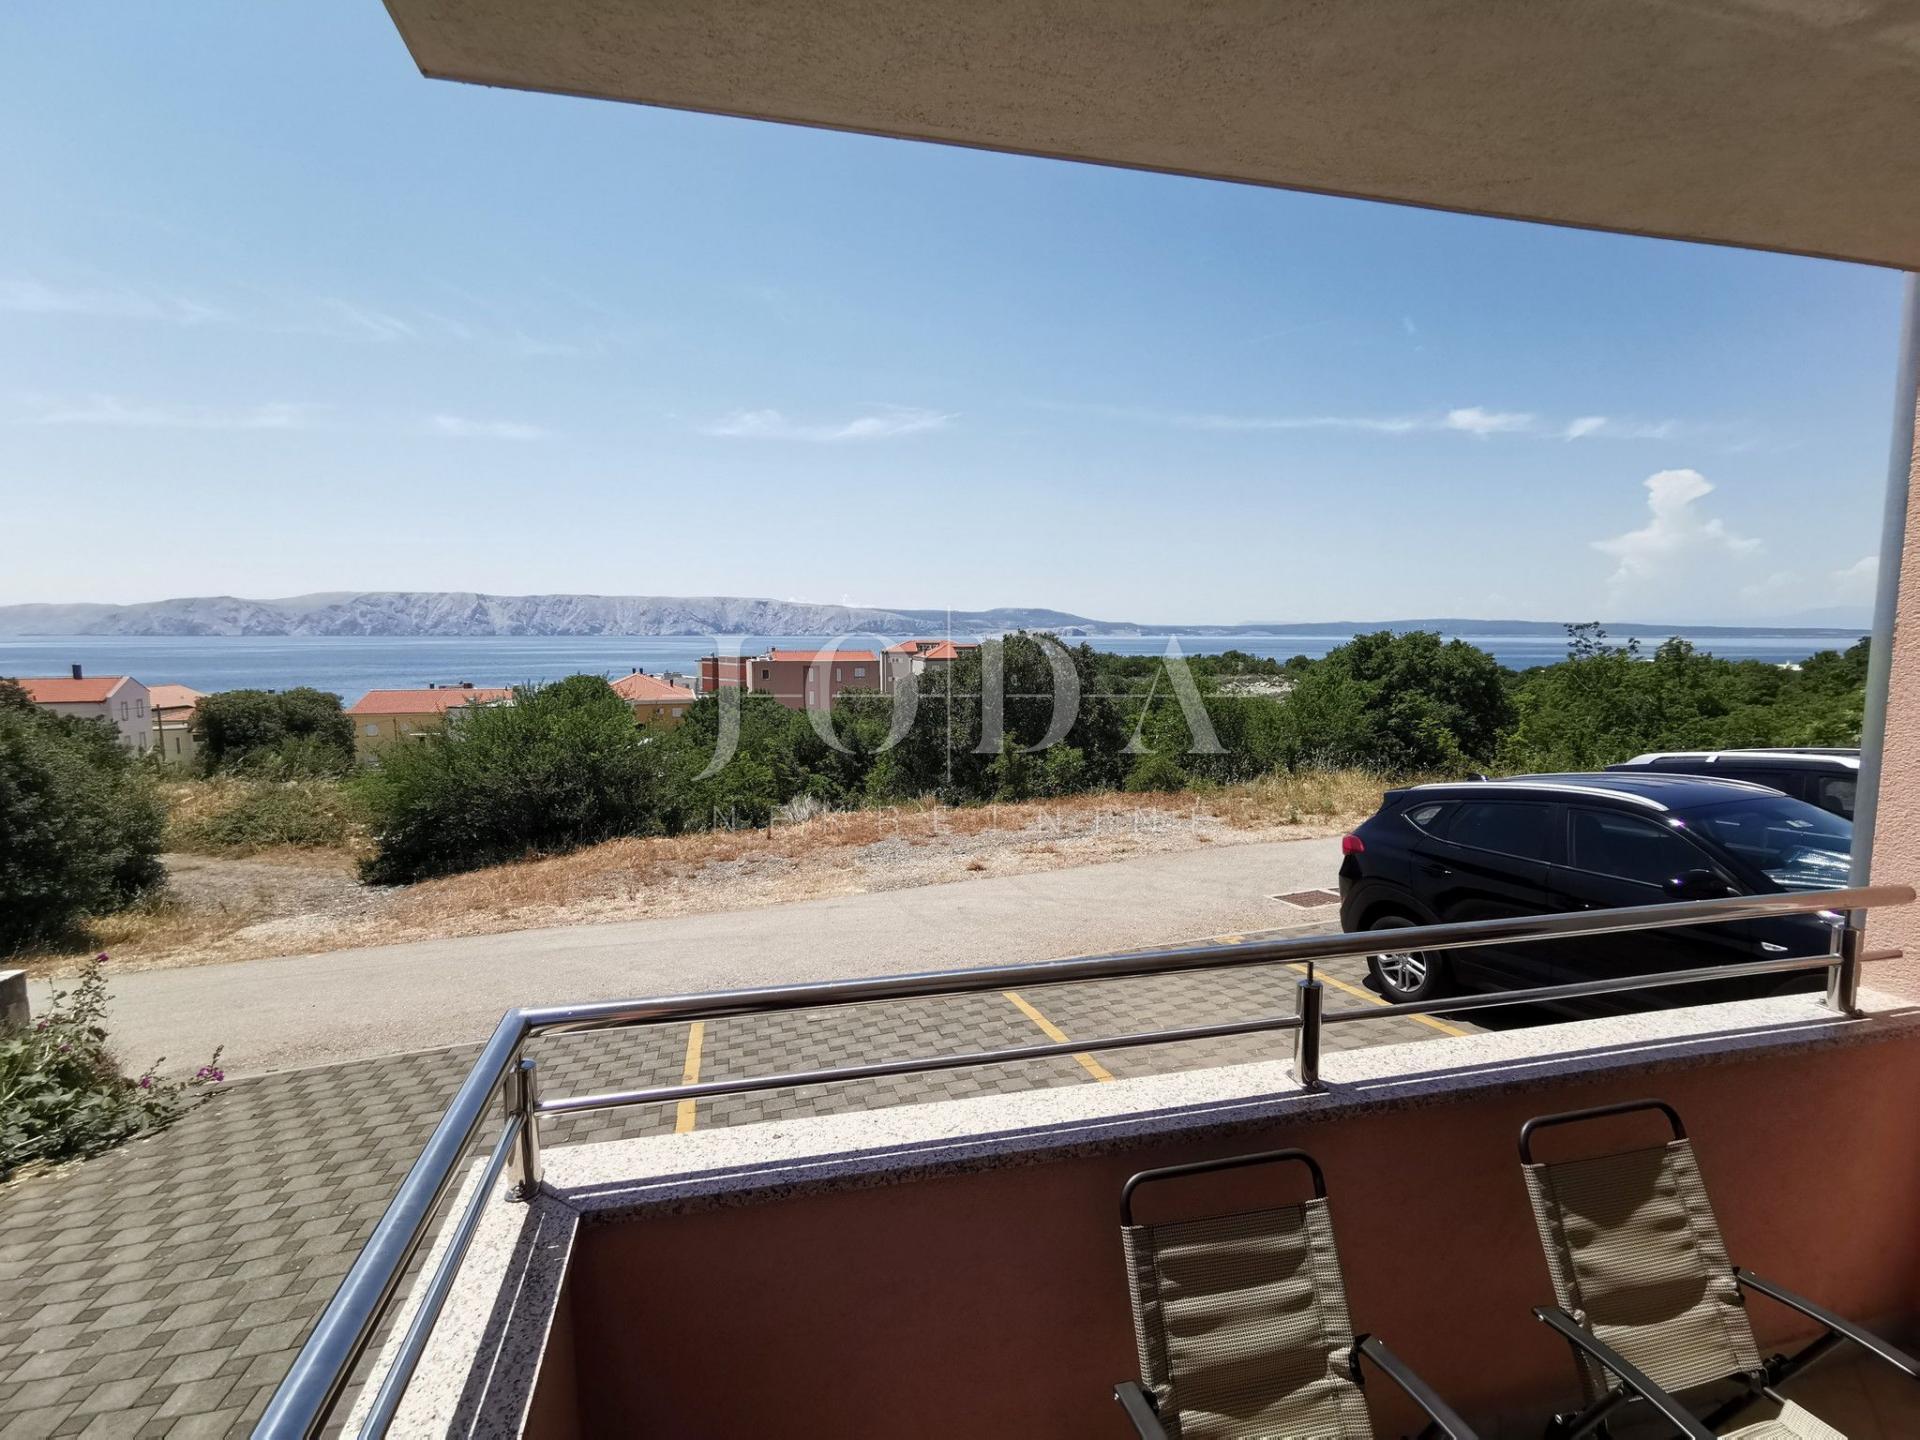 Smokvica dvosobni apartman blizu mora